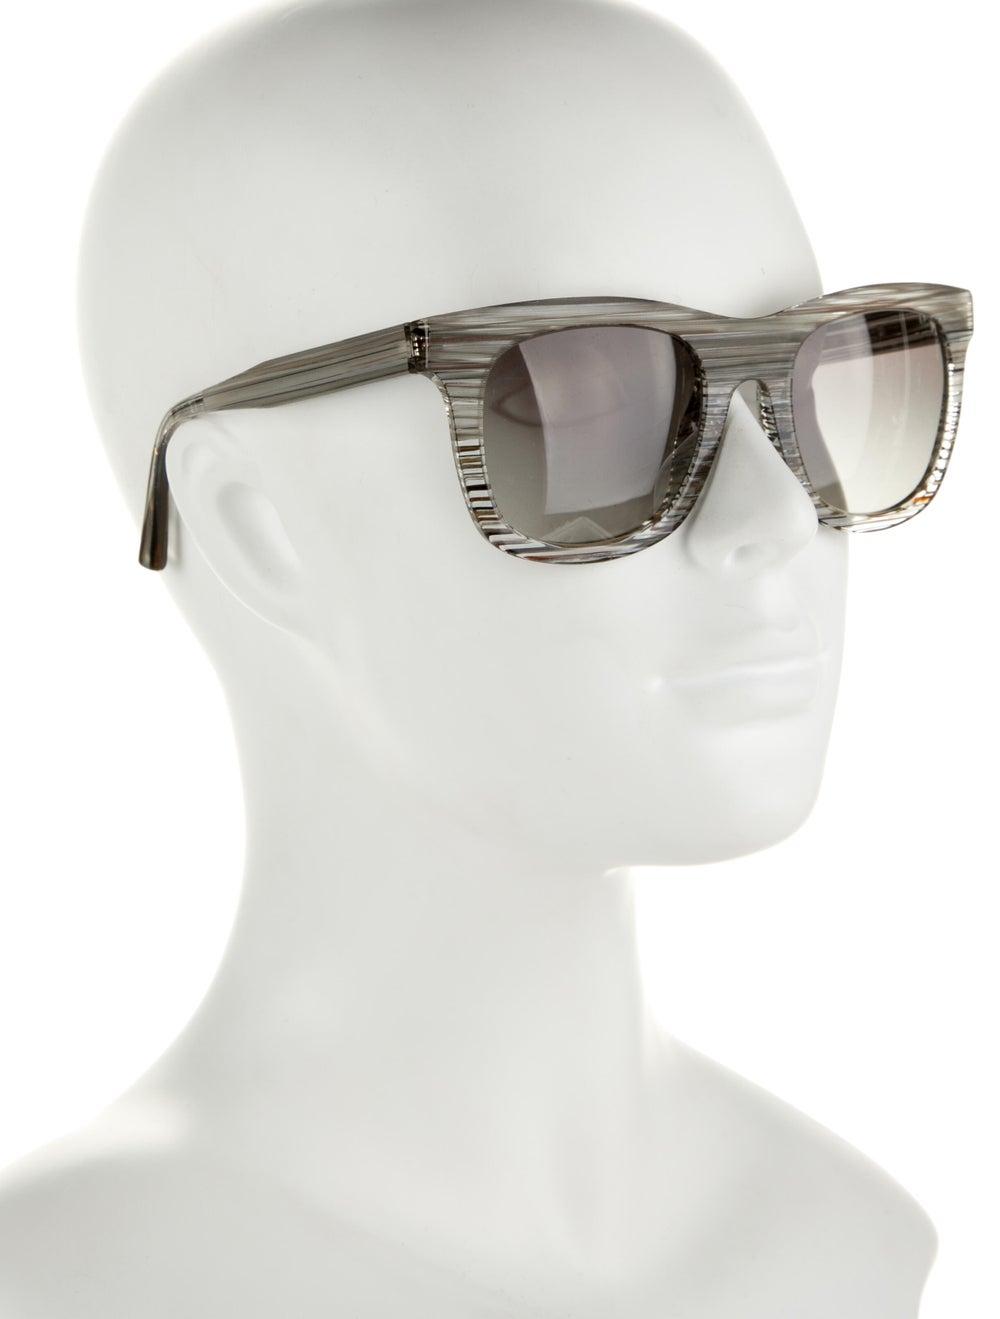 Alain Mikli Tinted Wayfarer Sunglasses Grey - image 4